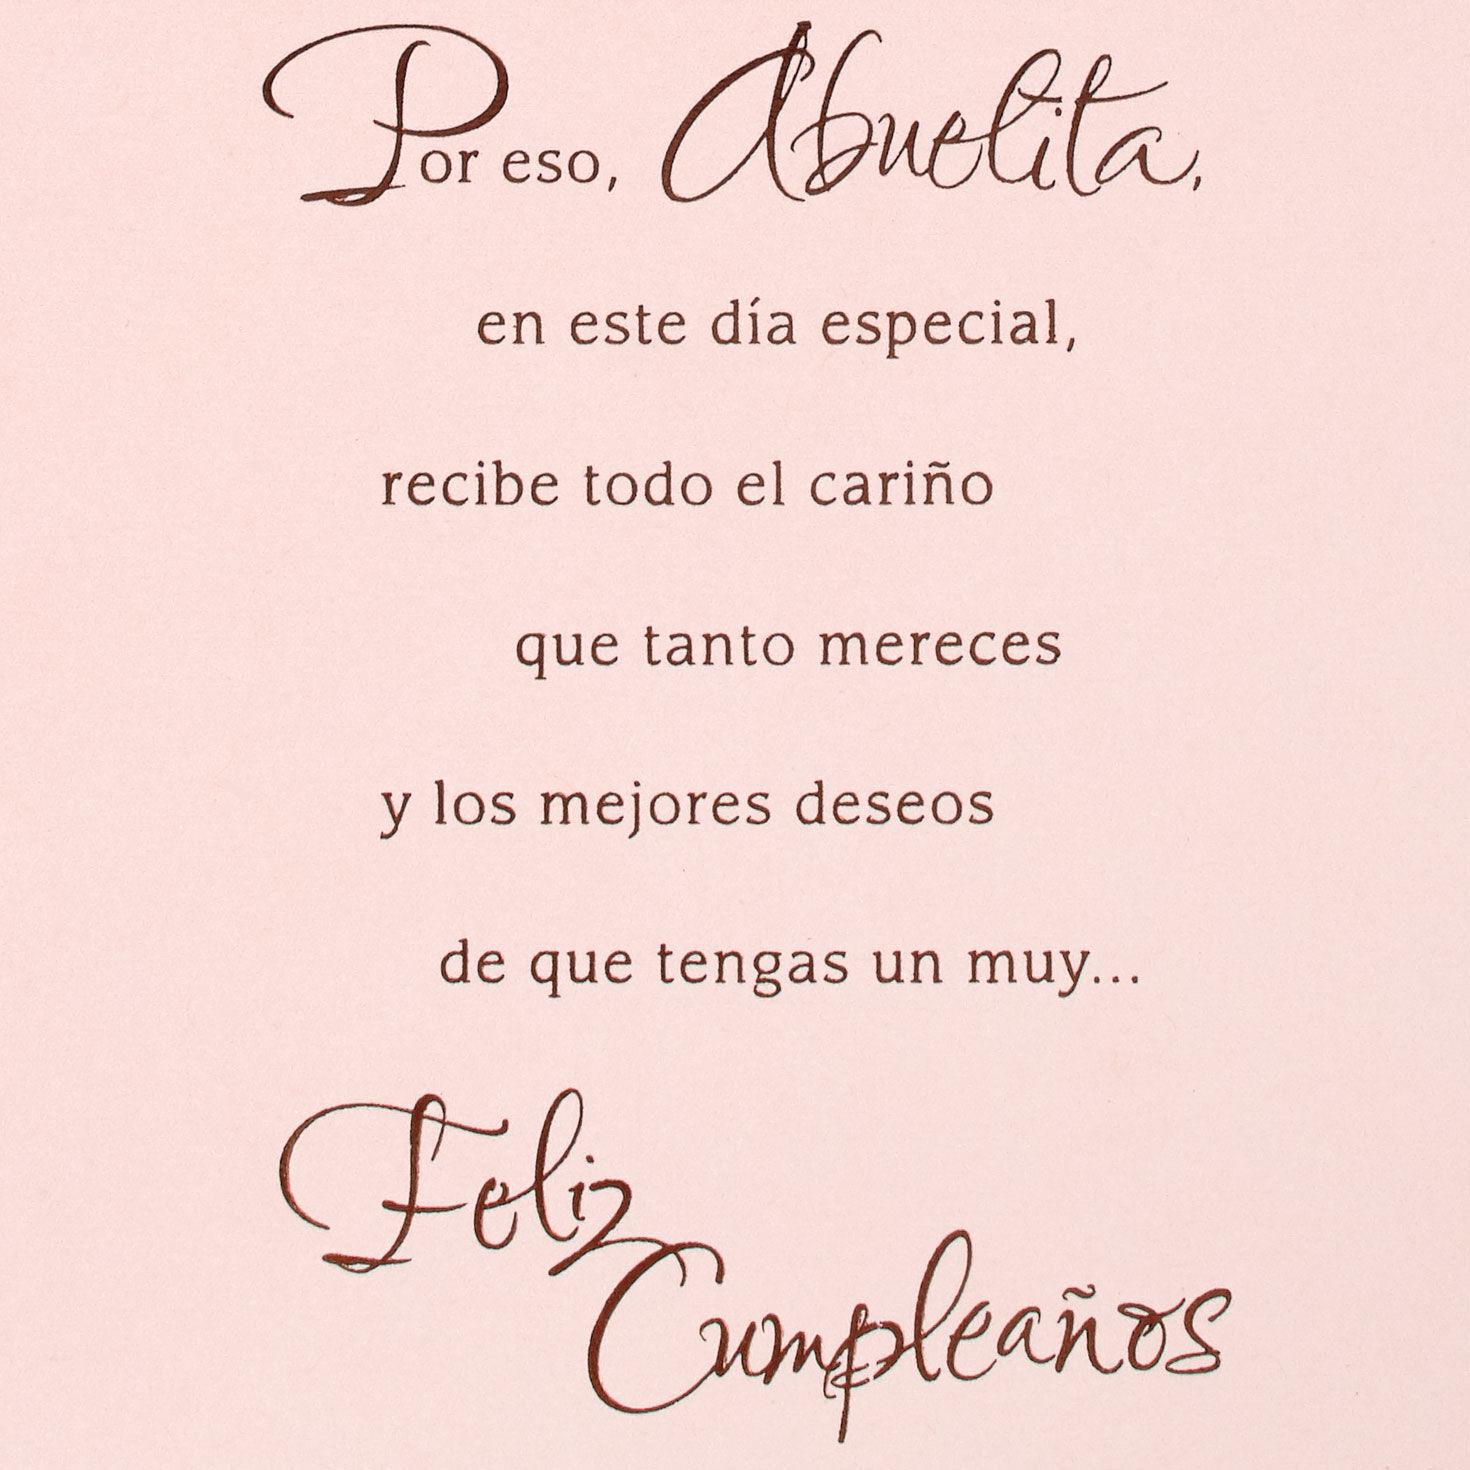 Legacy Of Your Love Spanish Language Birthday Card For Grandmother Greeting Cards Hallmark